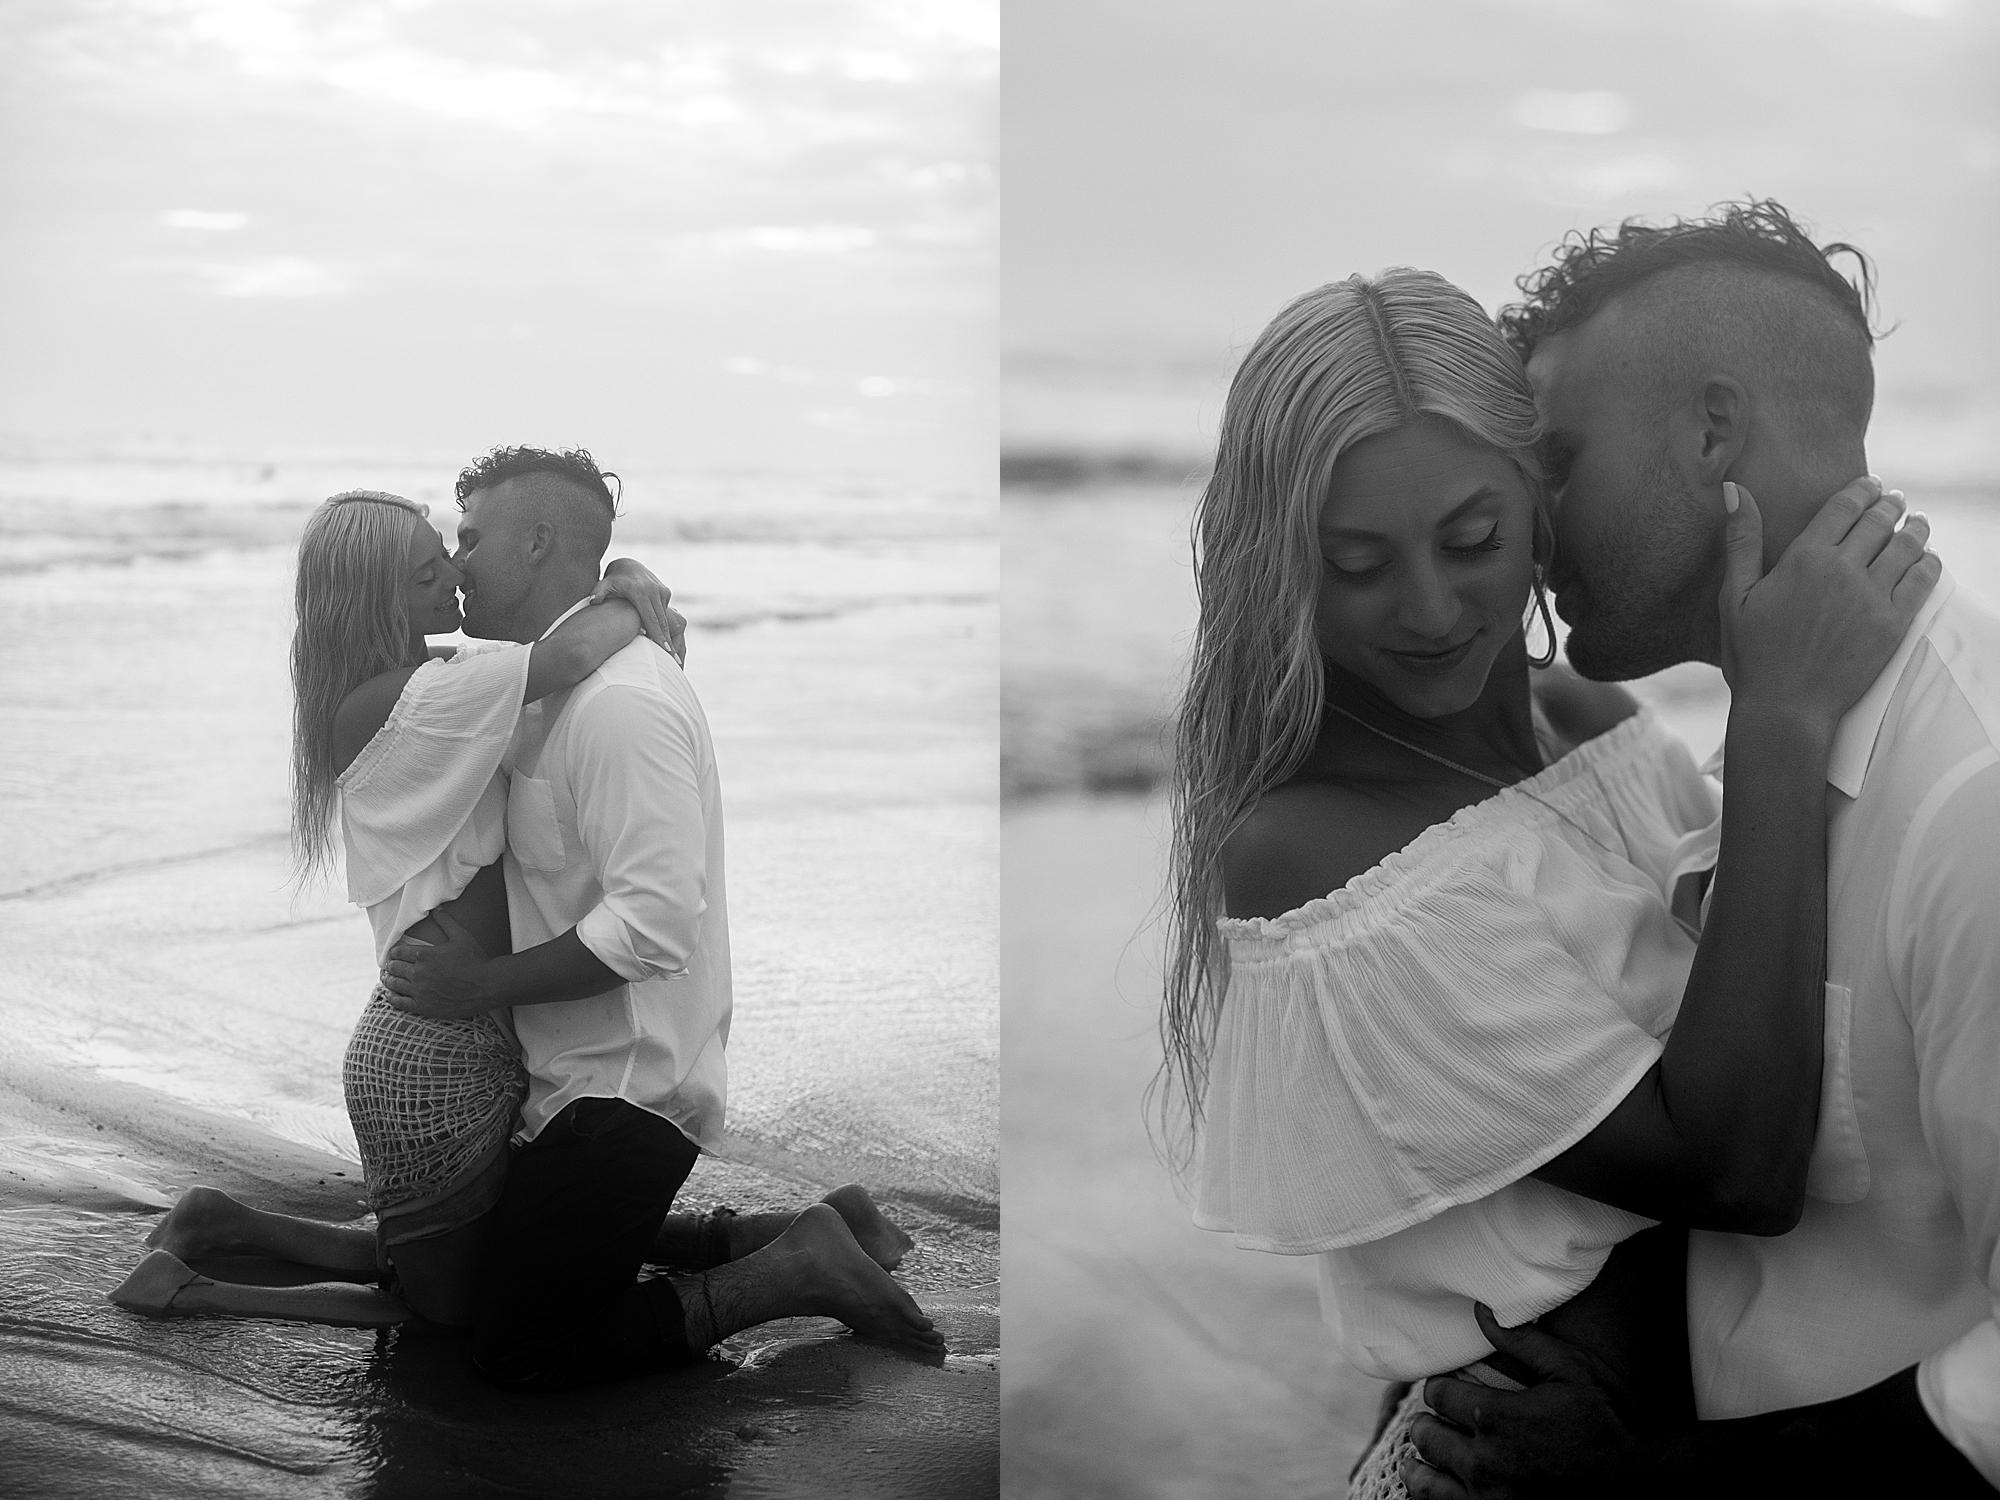 Epic and Adventurous Travel Wedding and Portrait Photographer in Nosara, Costa Rica - Kelee Bovelle @xokelee @keleeb - 17.jpg